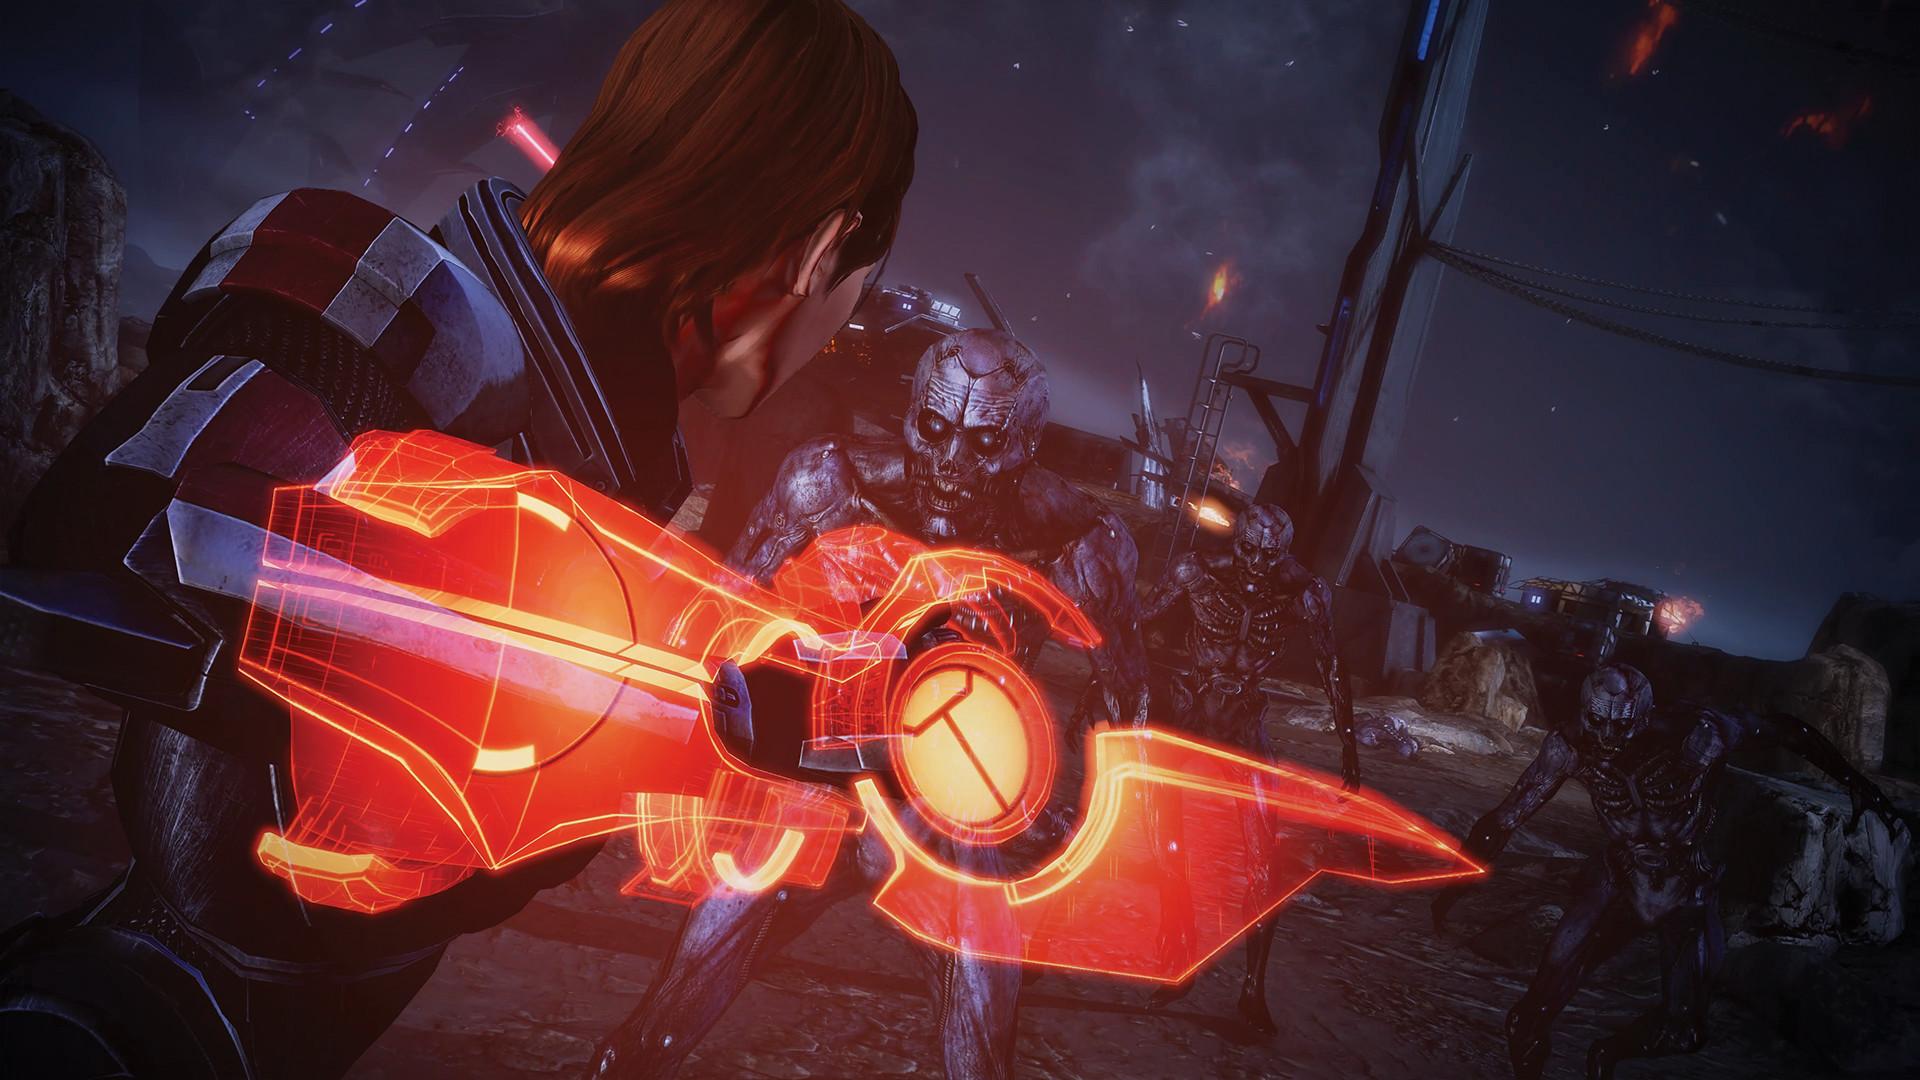 Commander Shepherd in Mass Effect Legendary Edition battling an enemy